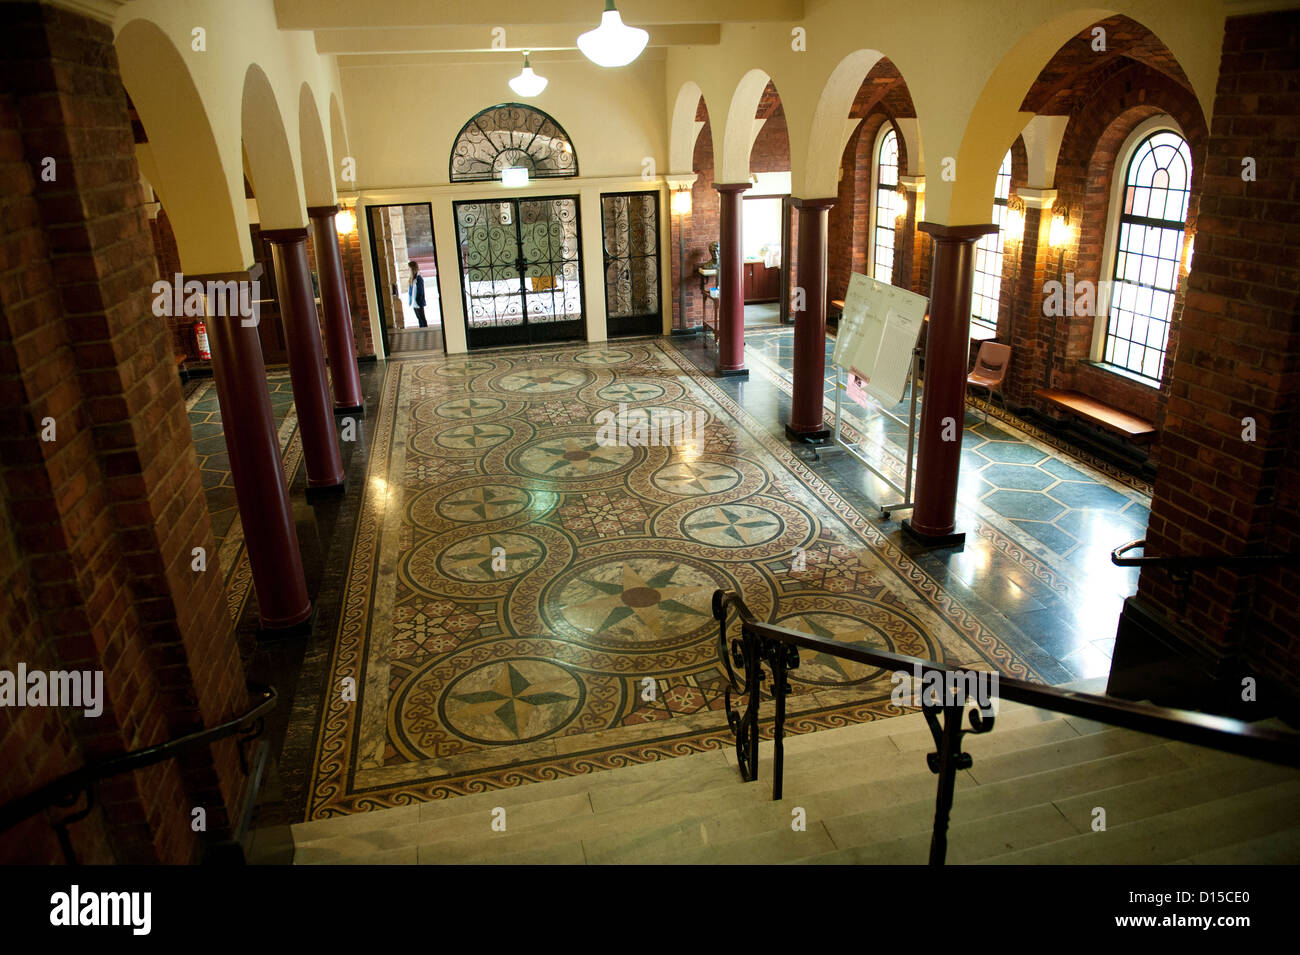 Foyer And Entryways University : Entrance foyer of winthrop hall university western